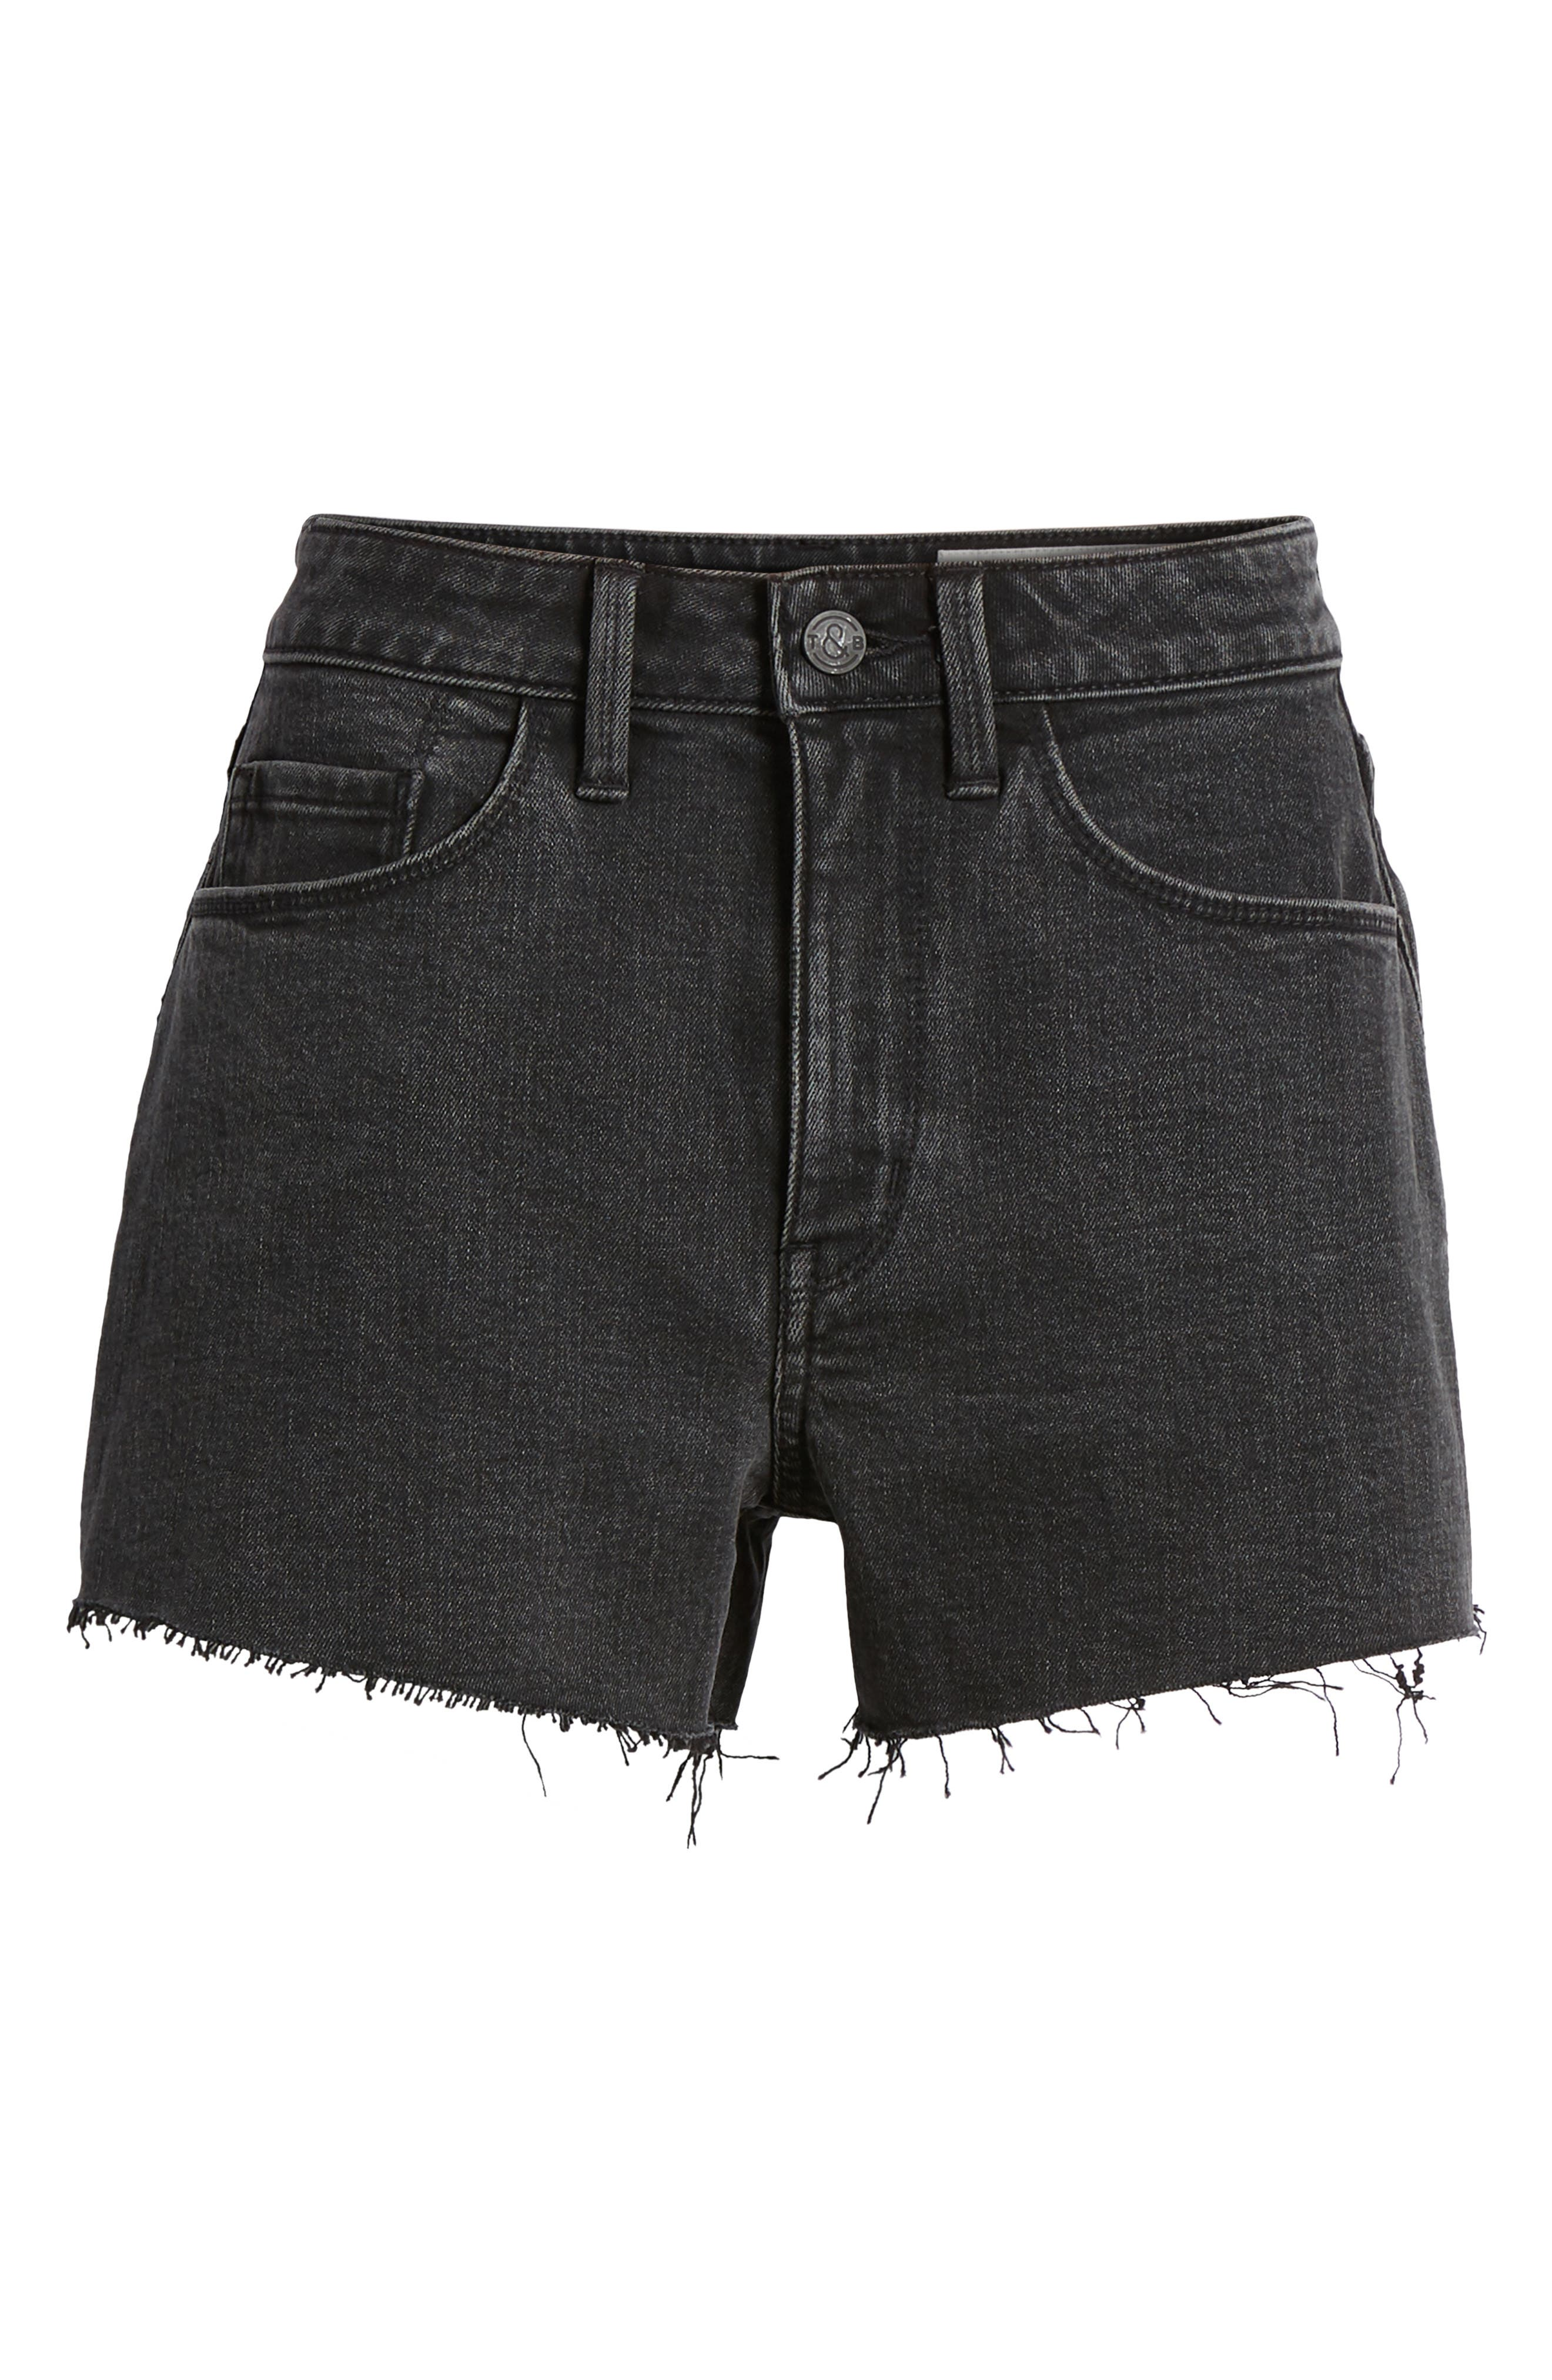 Foster High Waist Cutoff Boyfriend Denim Shorts,                             Alternate thumbnail 7, color,                             001